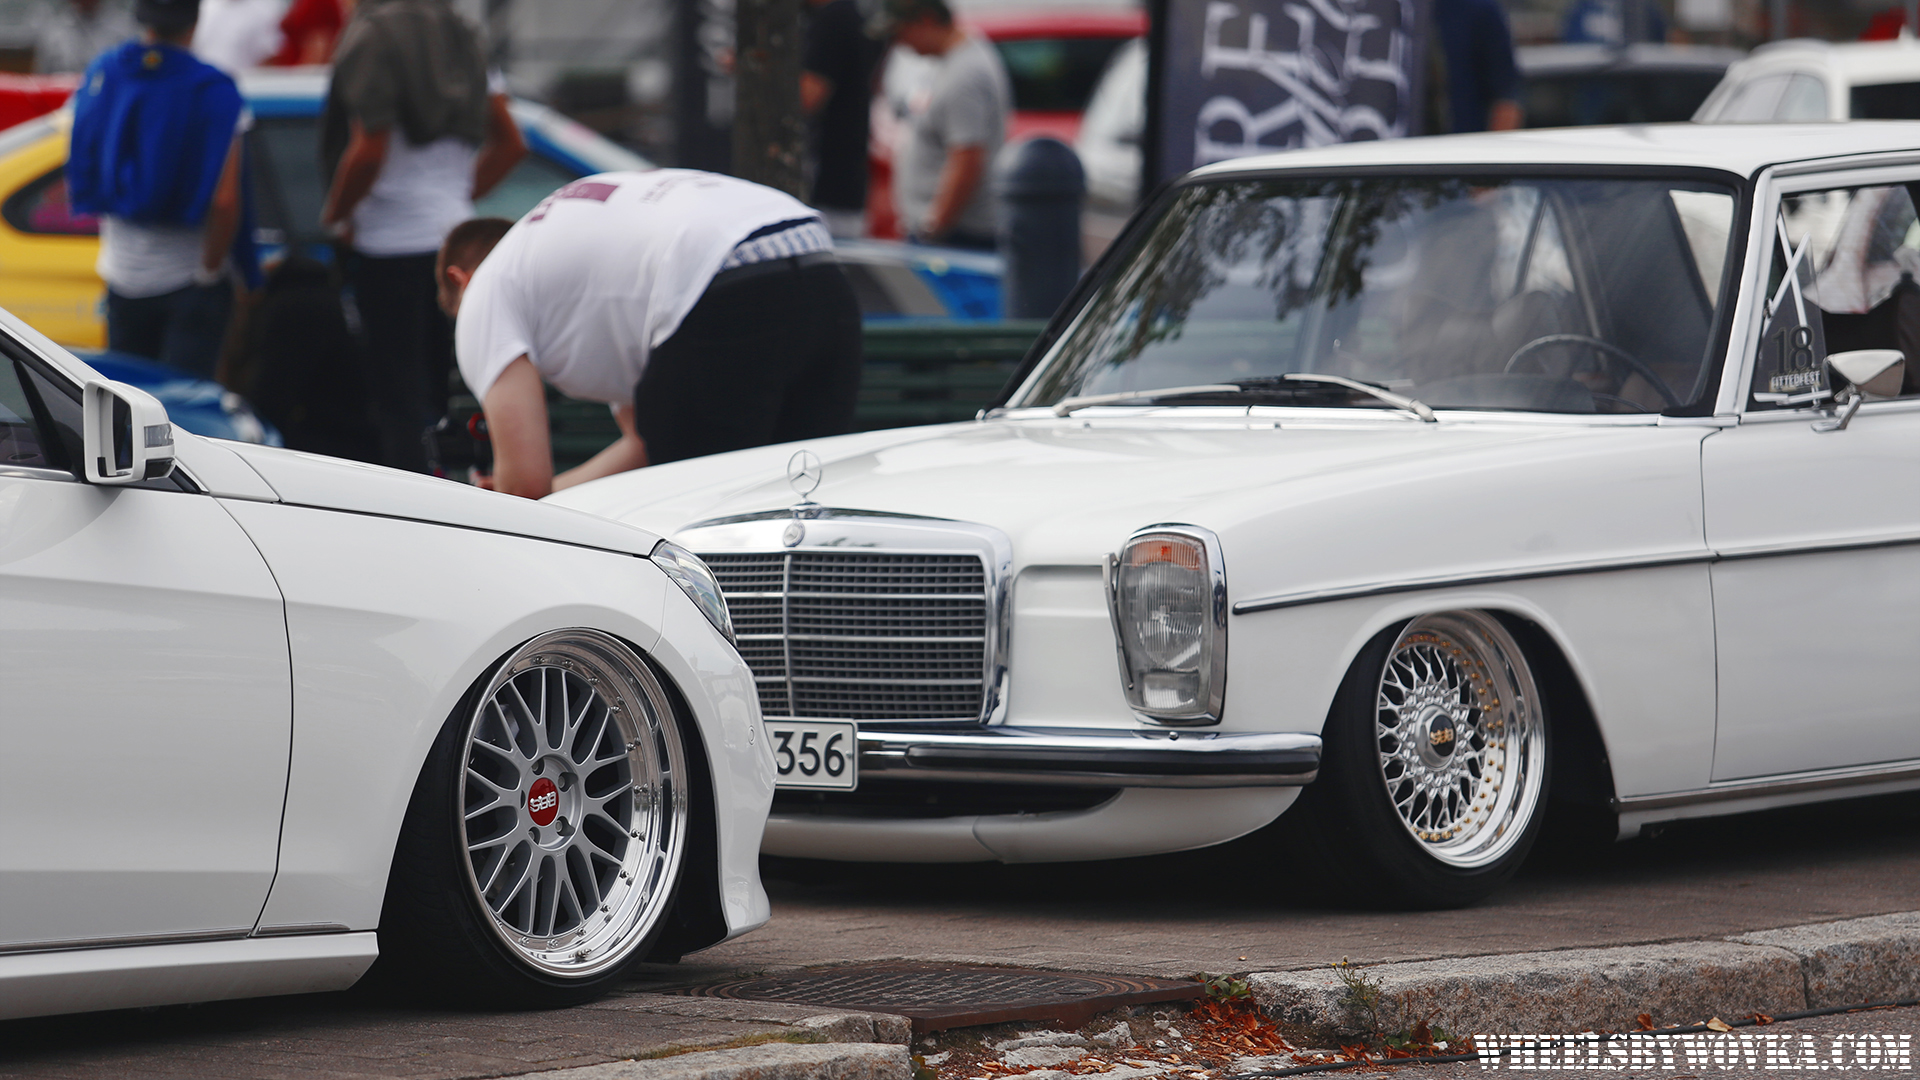 fitted-fest-lahti-finland-cdlcco-2018-by-wheelsbywovka-25